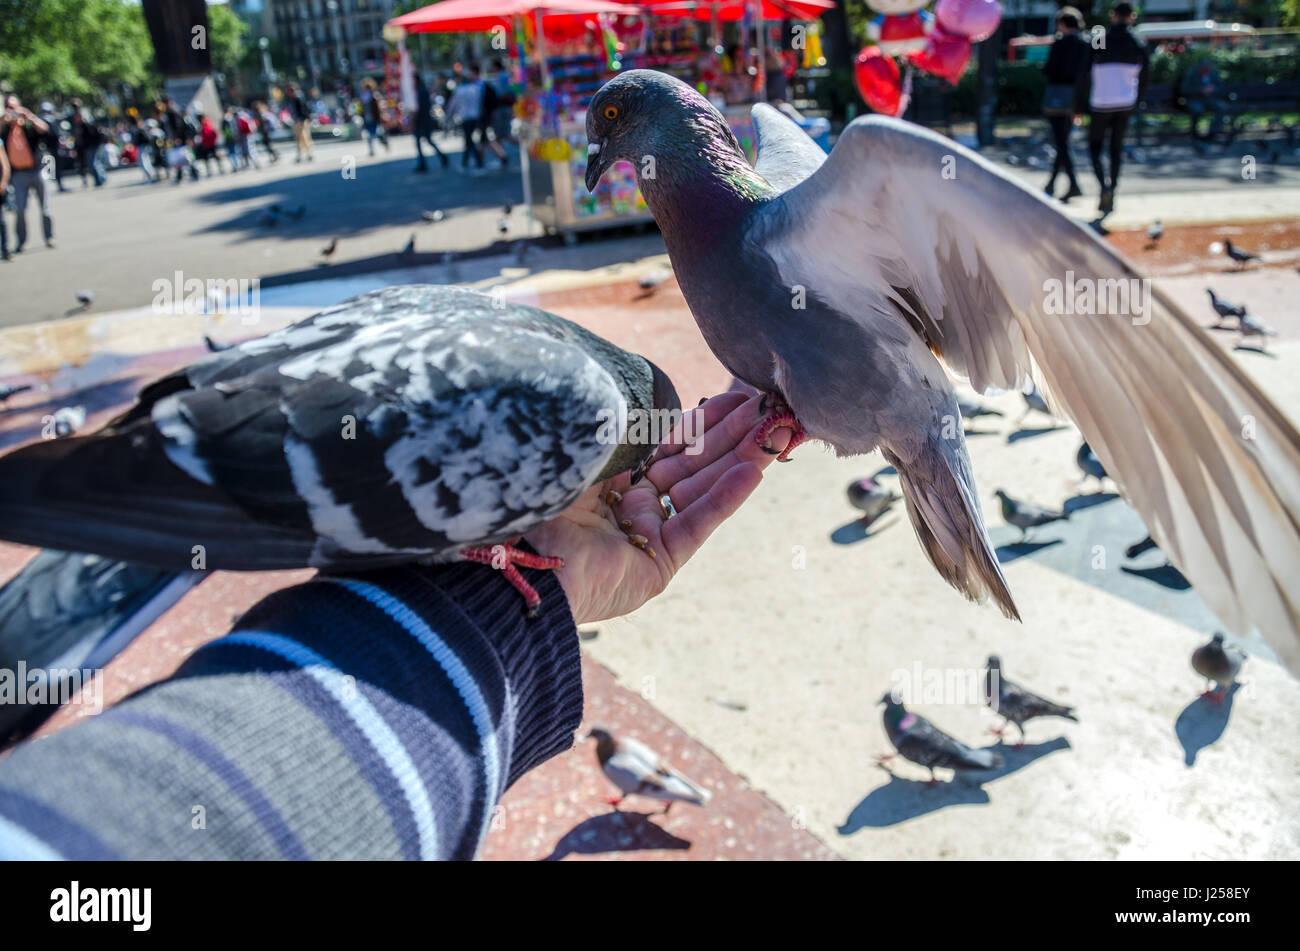 pigeons-eating-bird-seed-from-the-hand-in-plaa-de-catalunya-in-the-J258EY.jpg